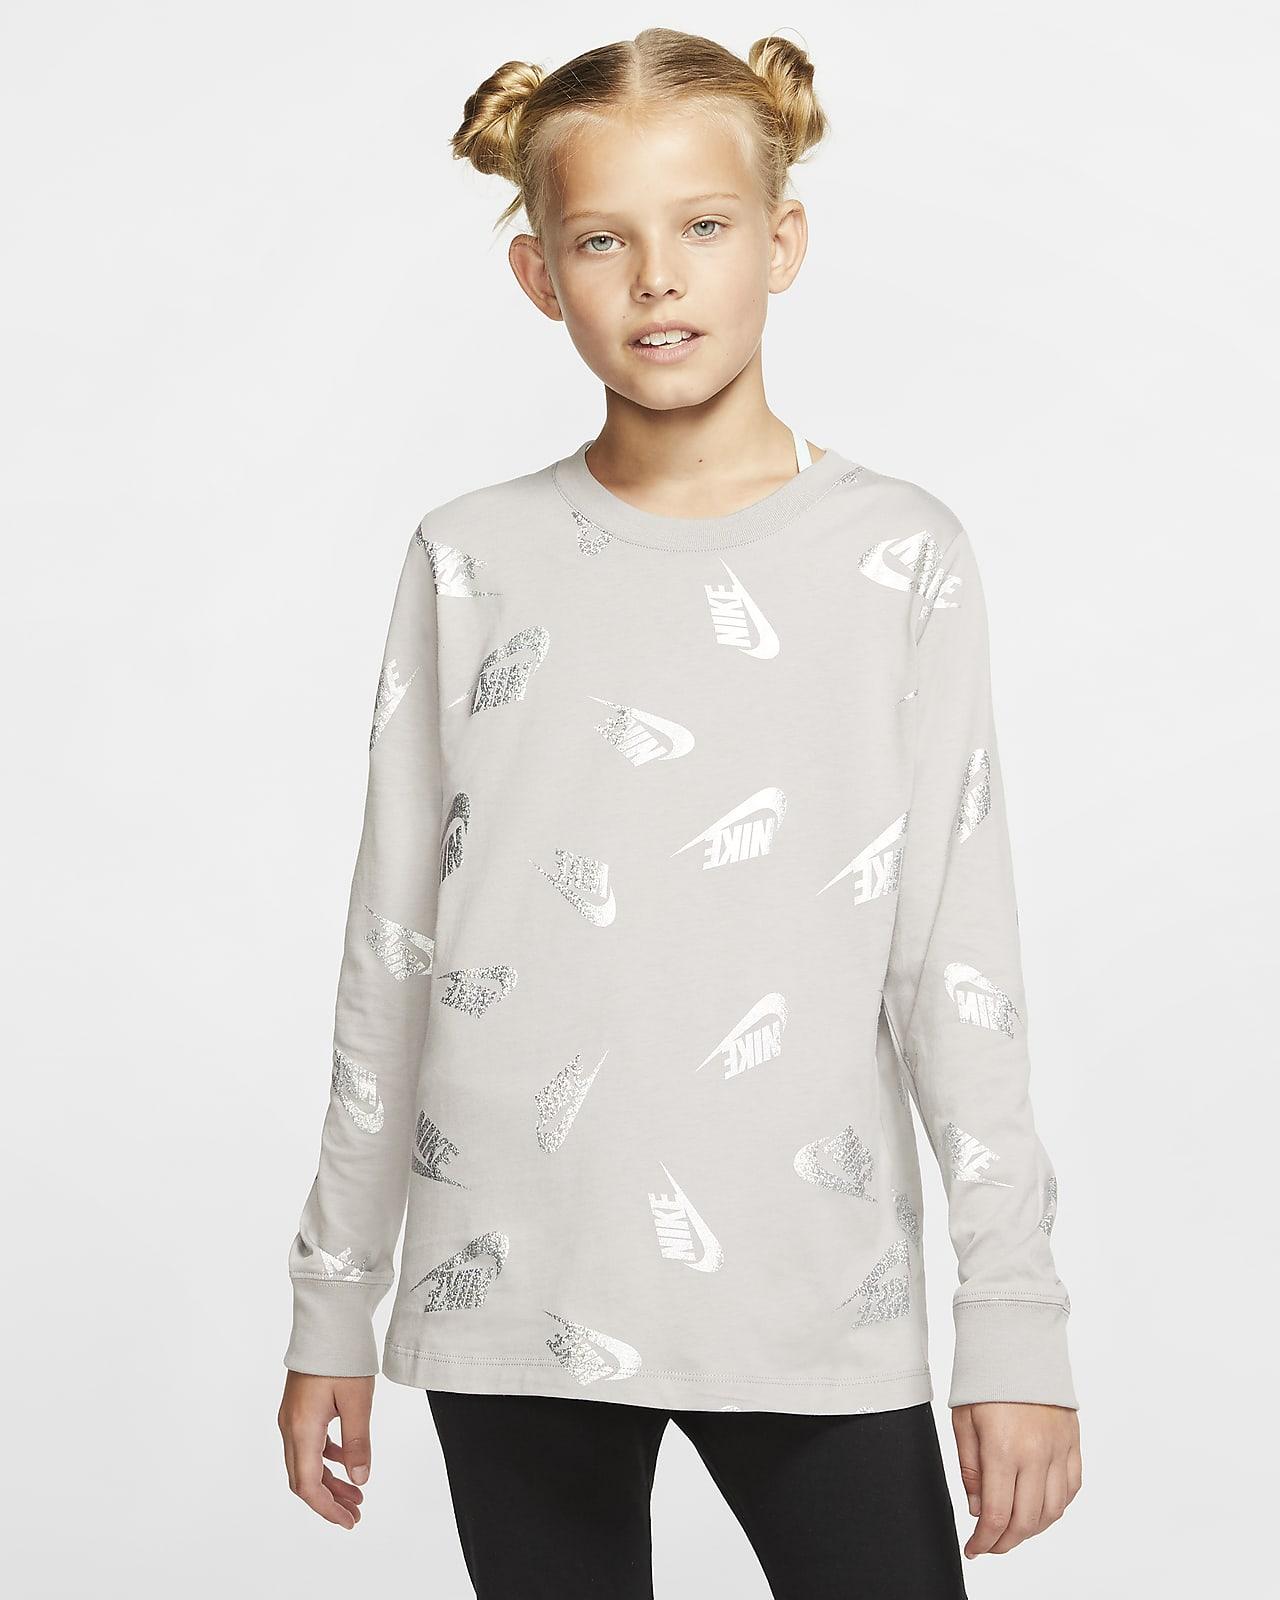 Nike Sportswear Langarm-T-Shirt für ältere Kinder